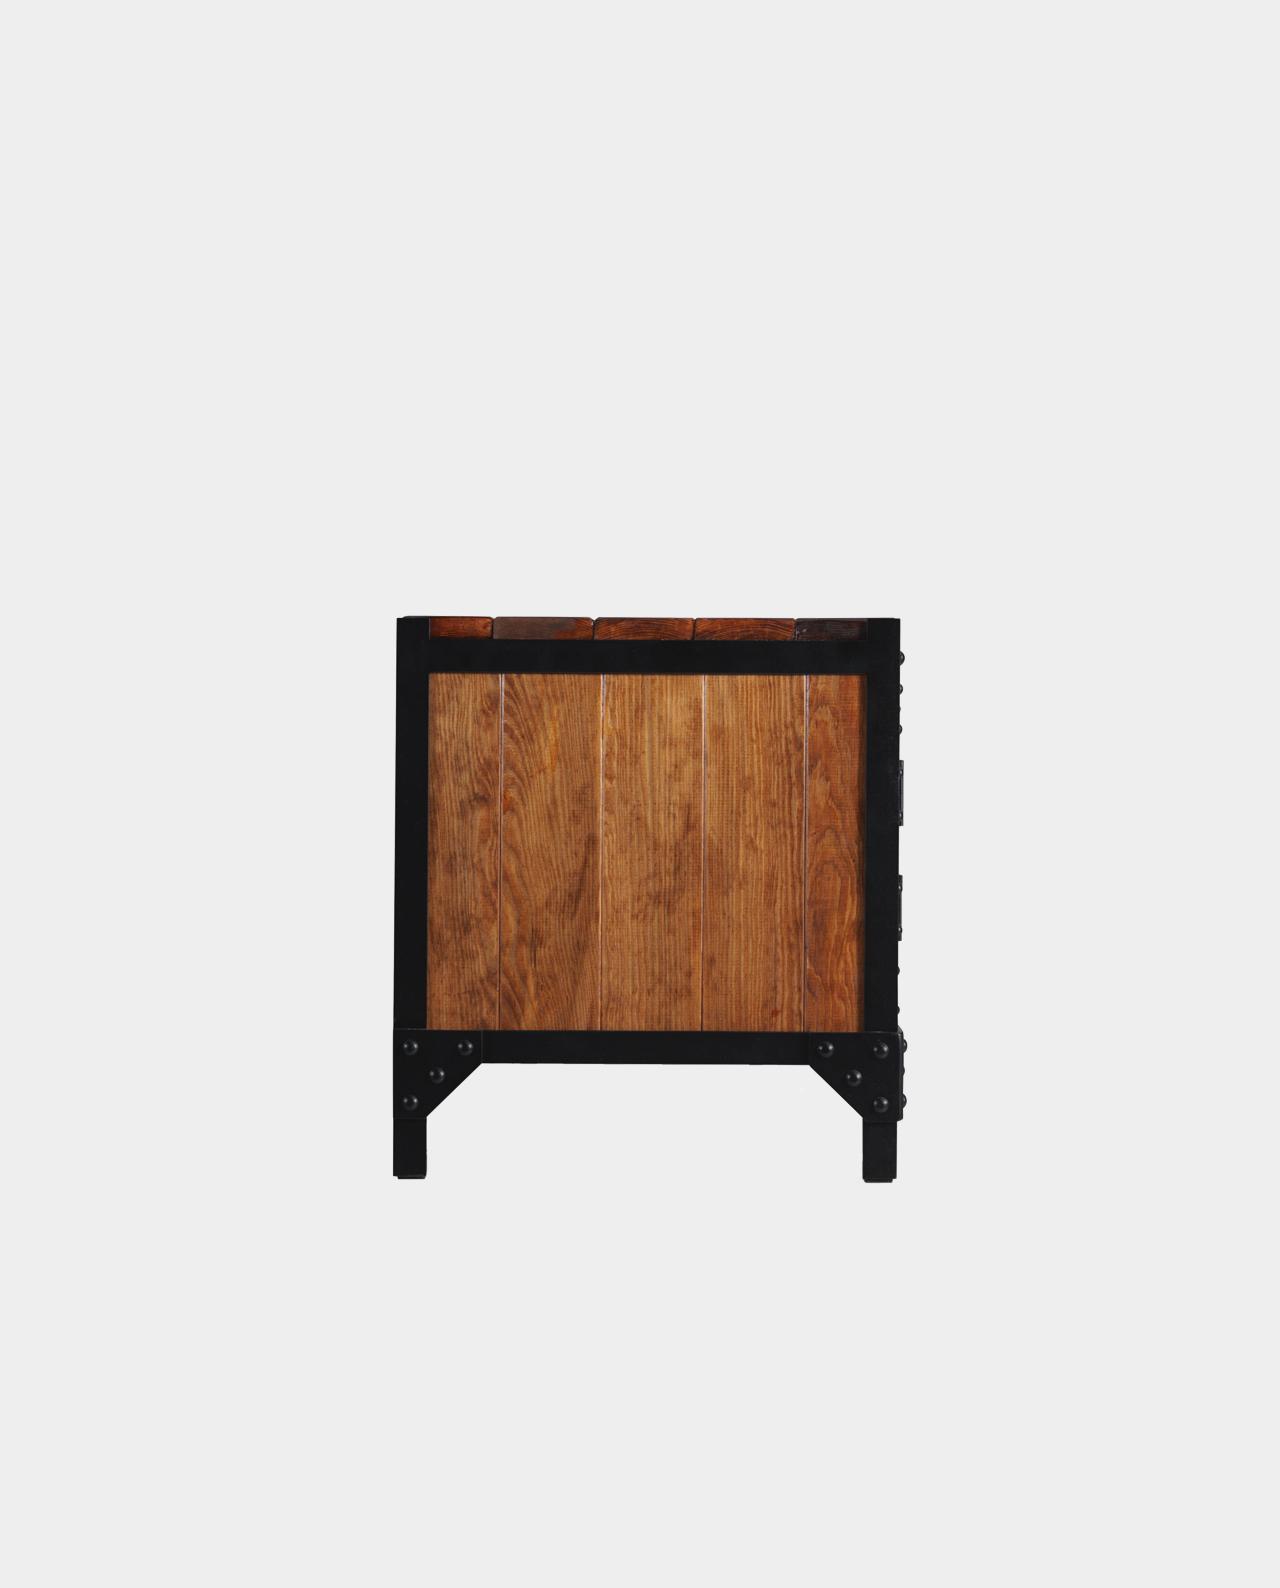 tv kommode staten island jetzt entdecken. Black Bedroom Furniture Sets. Home Design Ideas